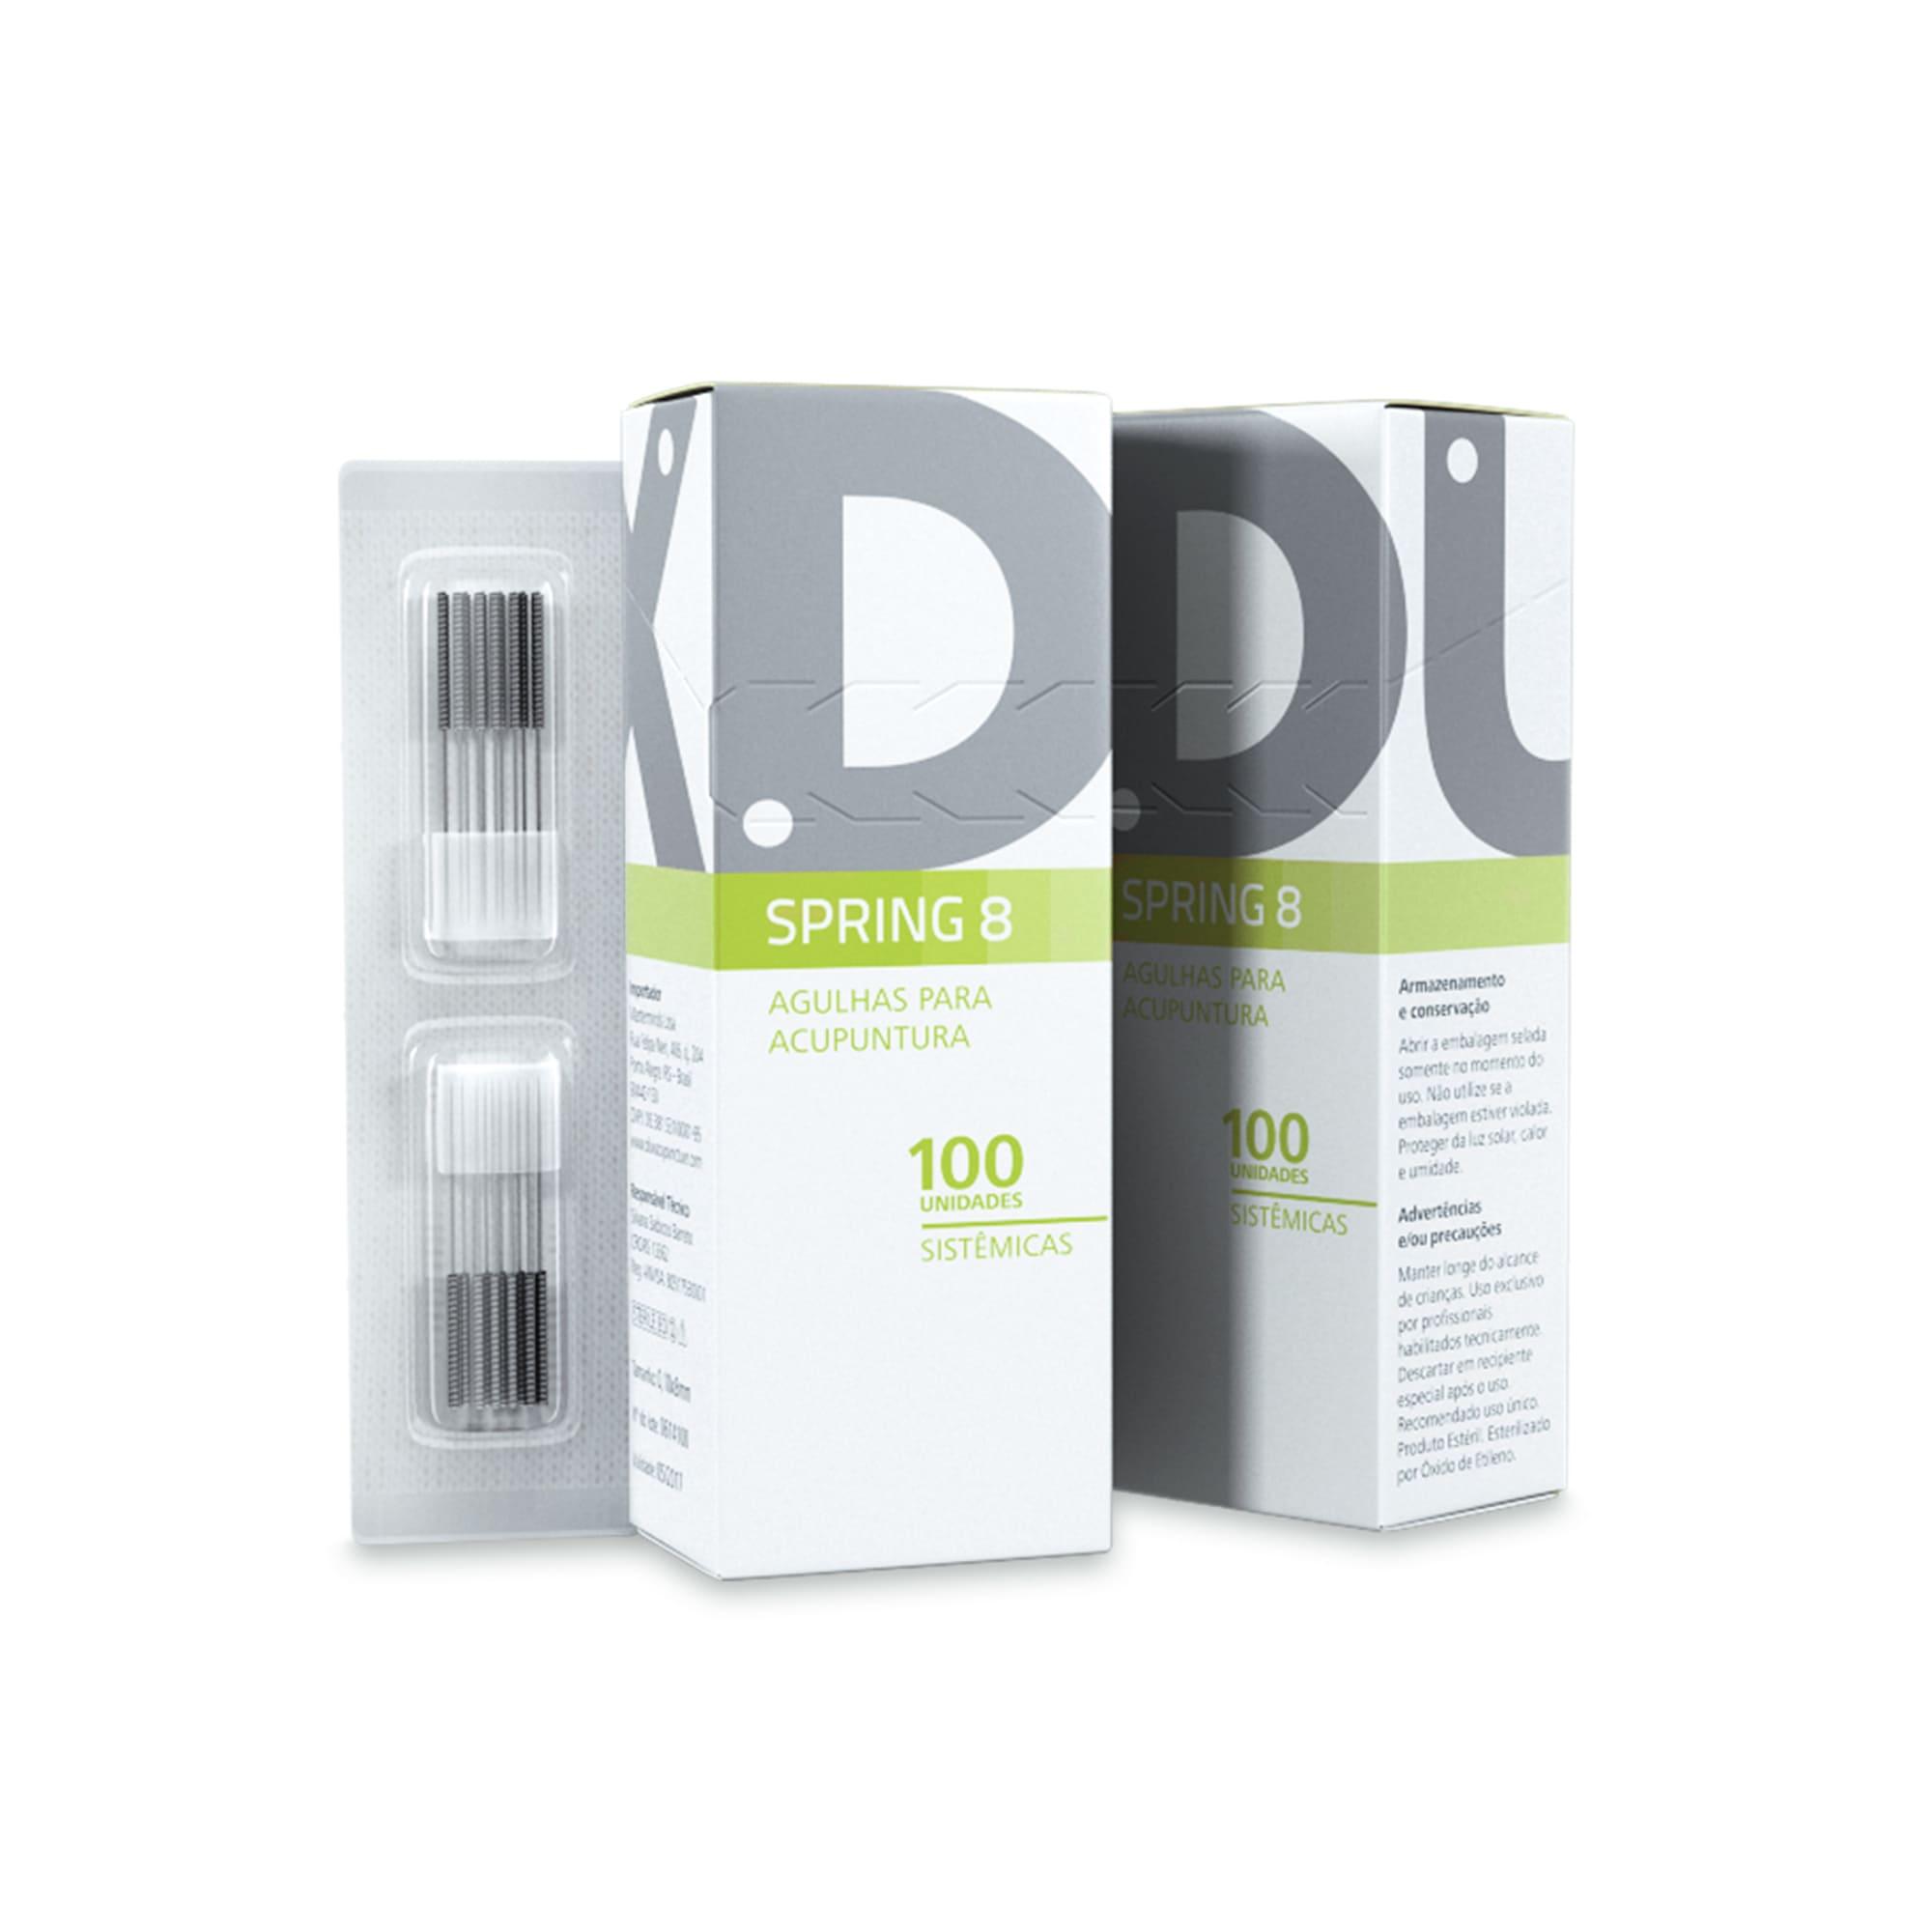 Agulhas Faciais para Acupuntura (Spring 8) - Dux Acupuncture